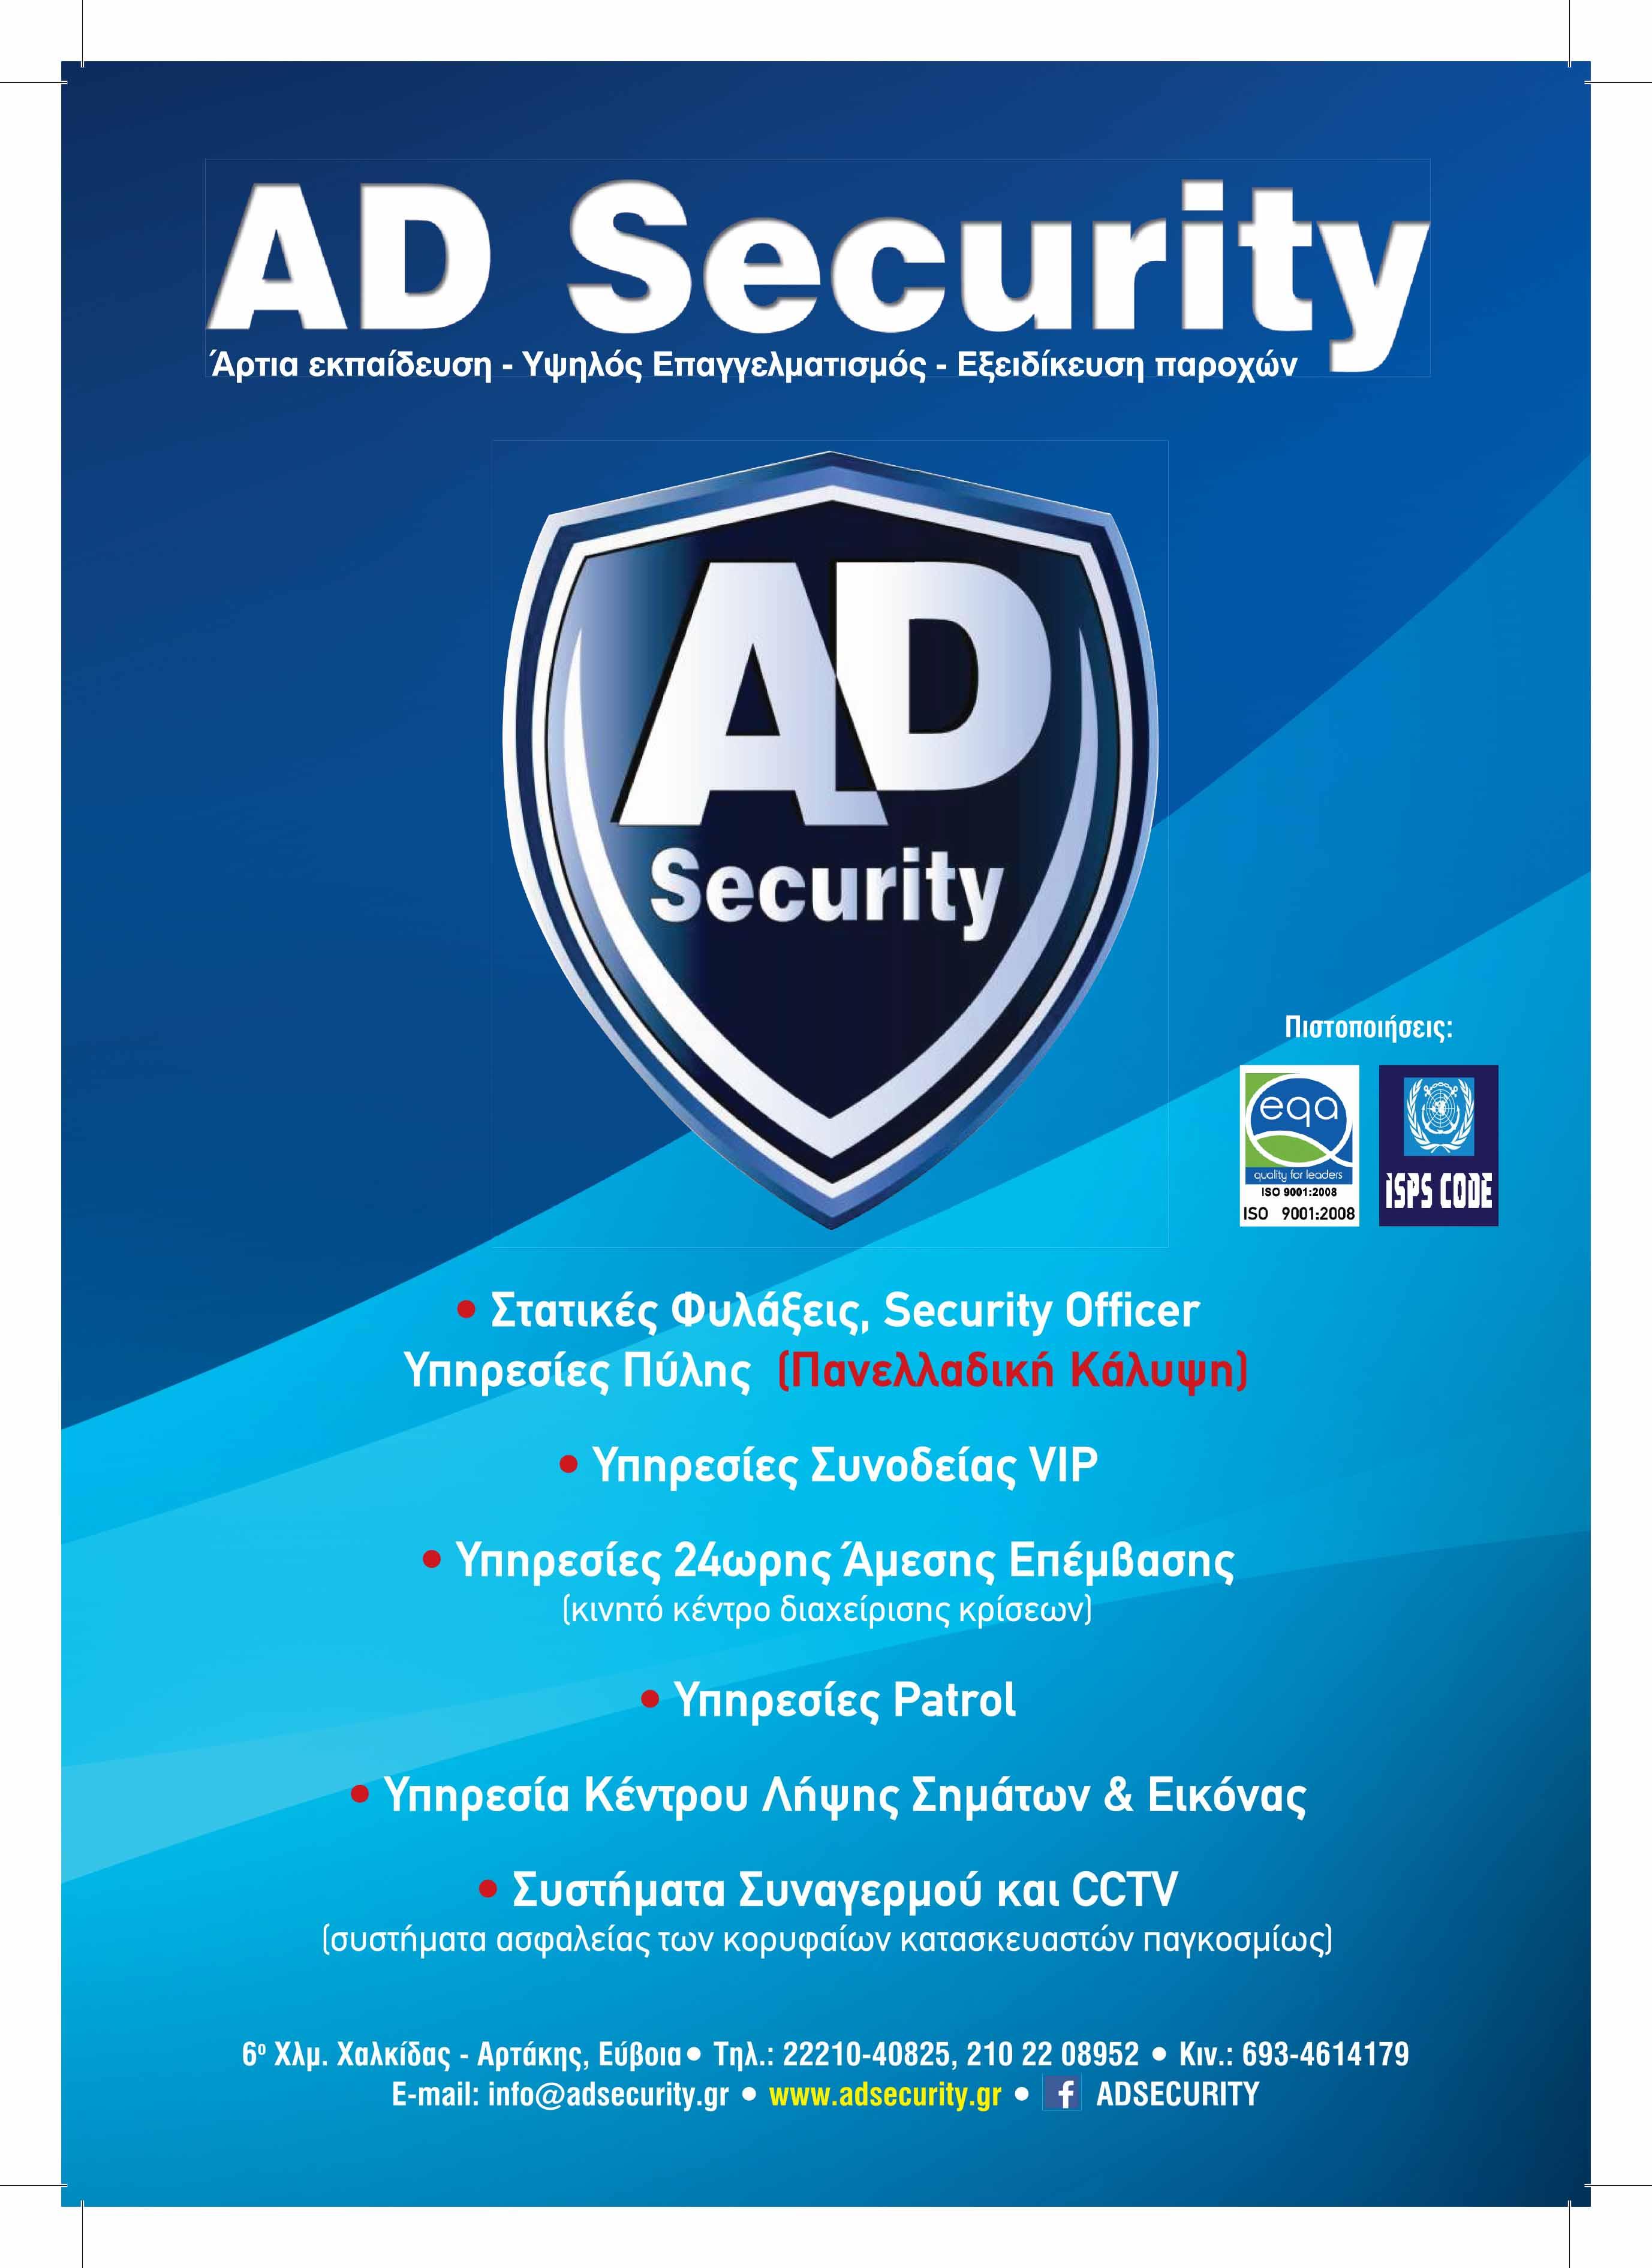 AD Security - Υπηρεσίες φύλαξης εγκαταστάσεων και προσώπων στην Χαλκίδα